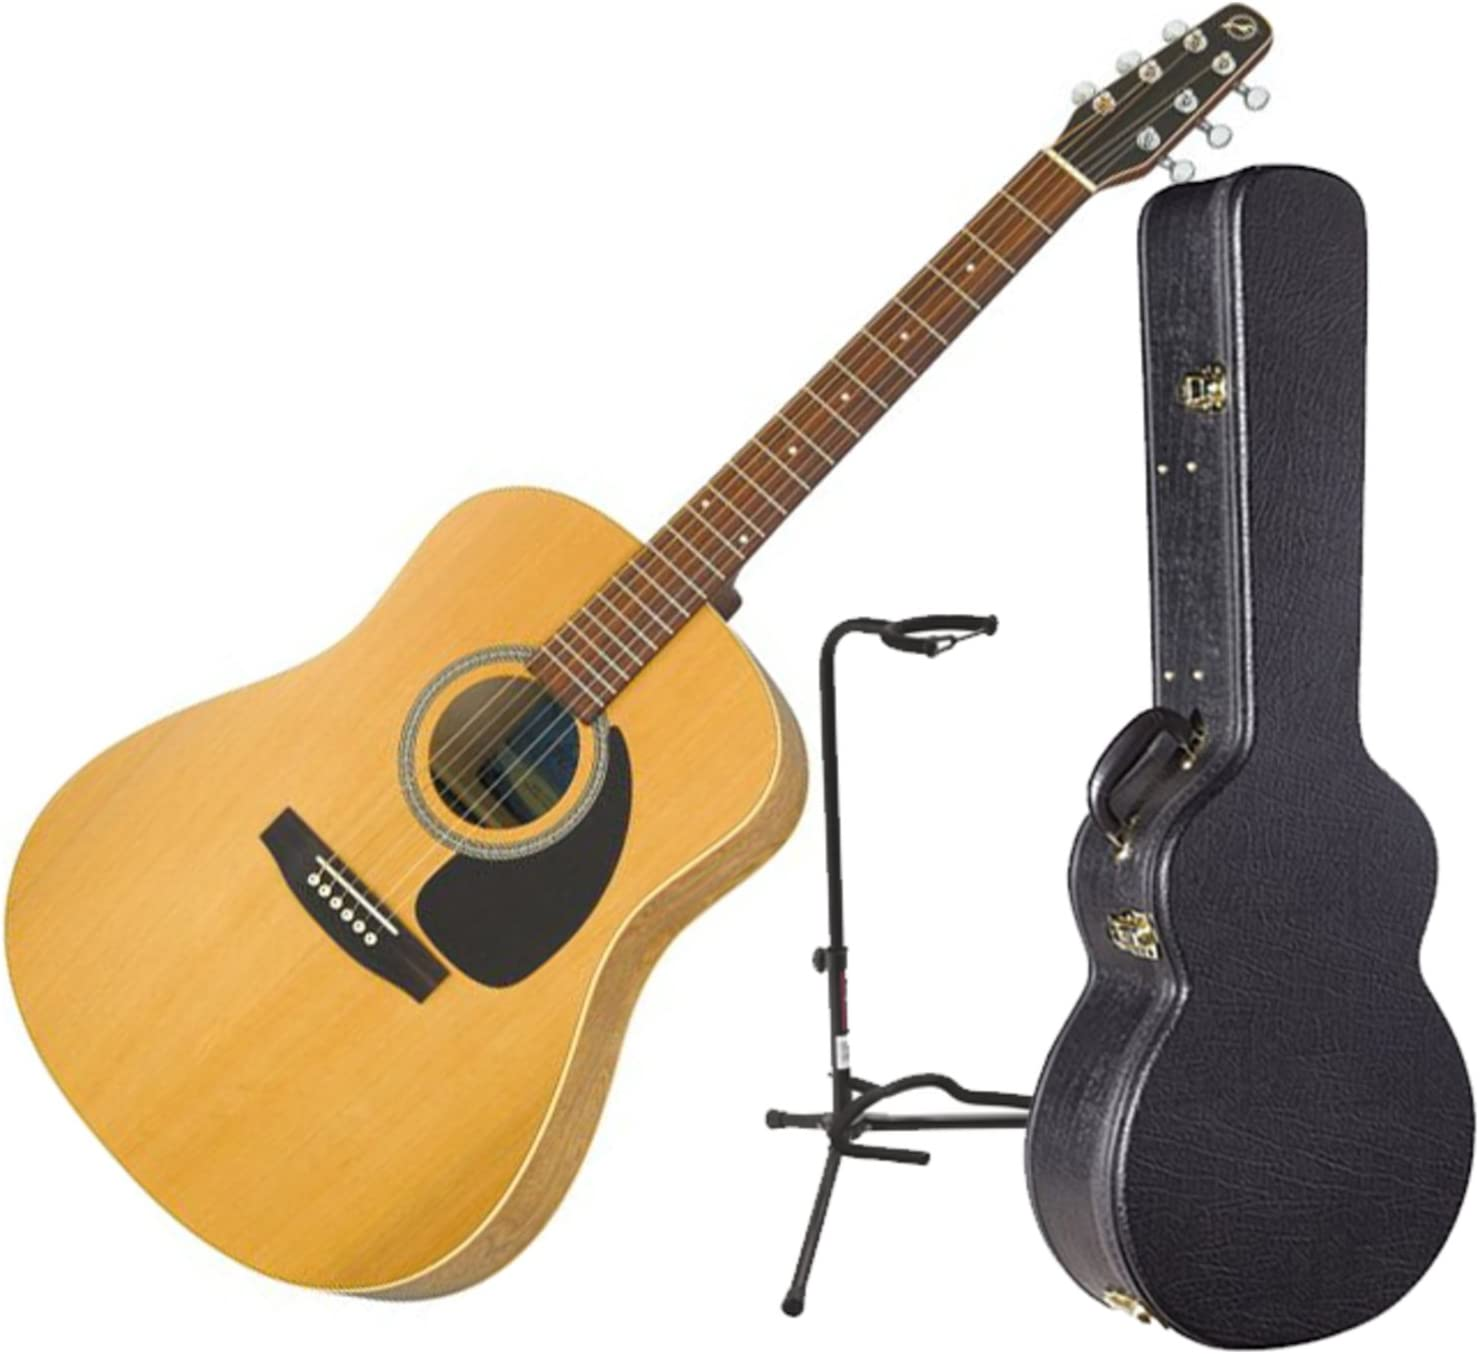 Godin guitarras 28733-bundle Electroacústica guitarra: Amazon.es ...